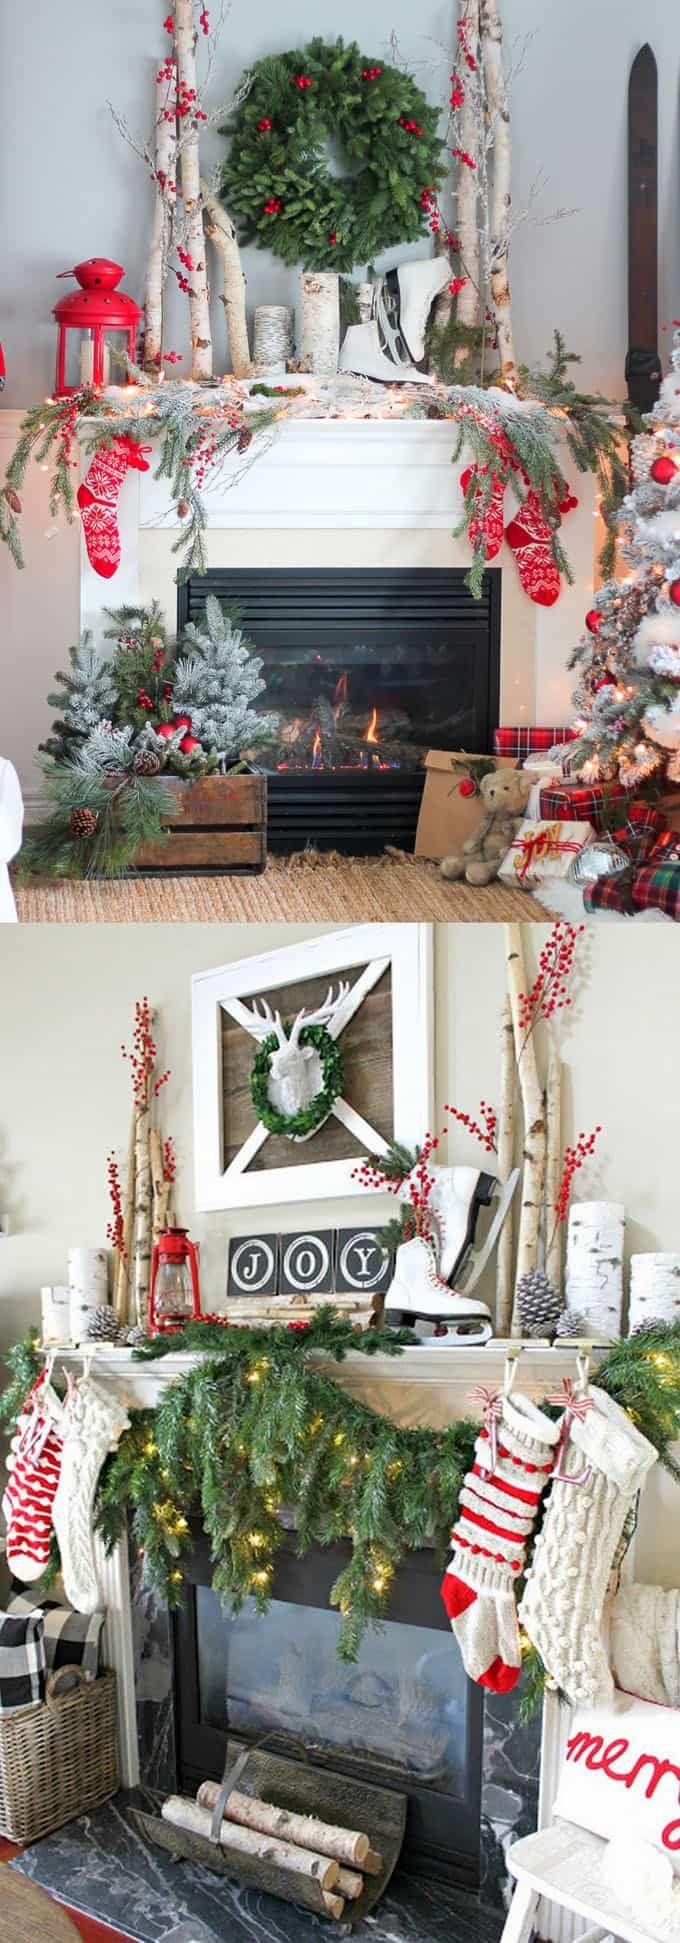 Top Posts of 2018 Christmas bedroom